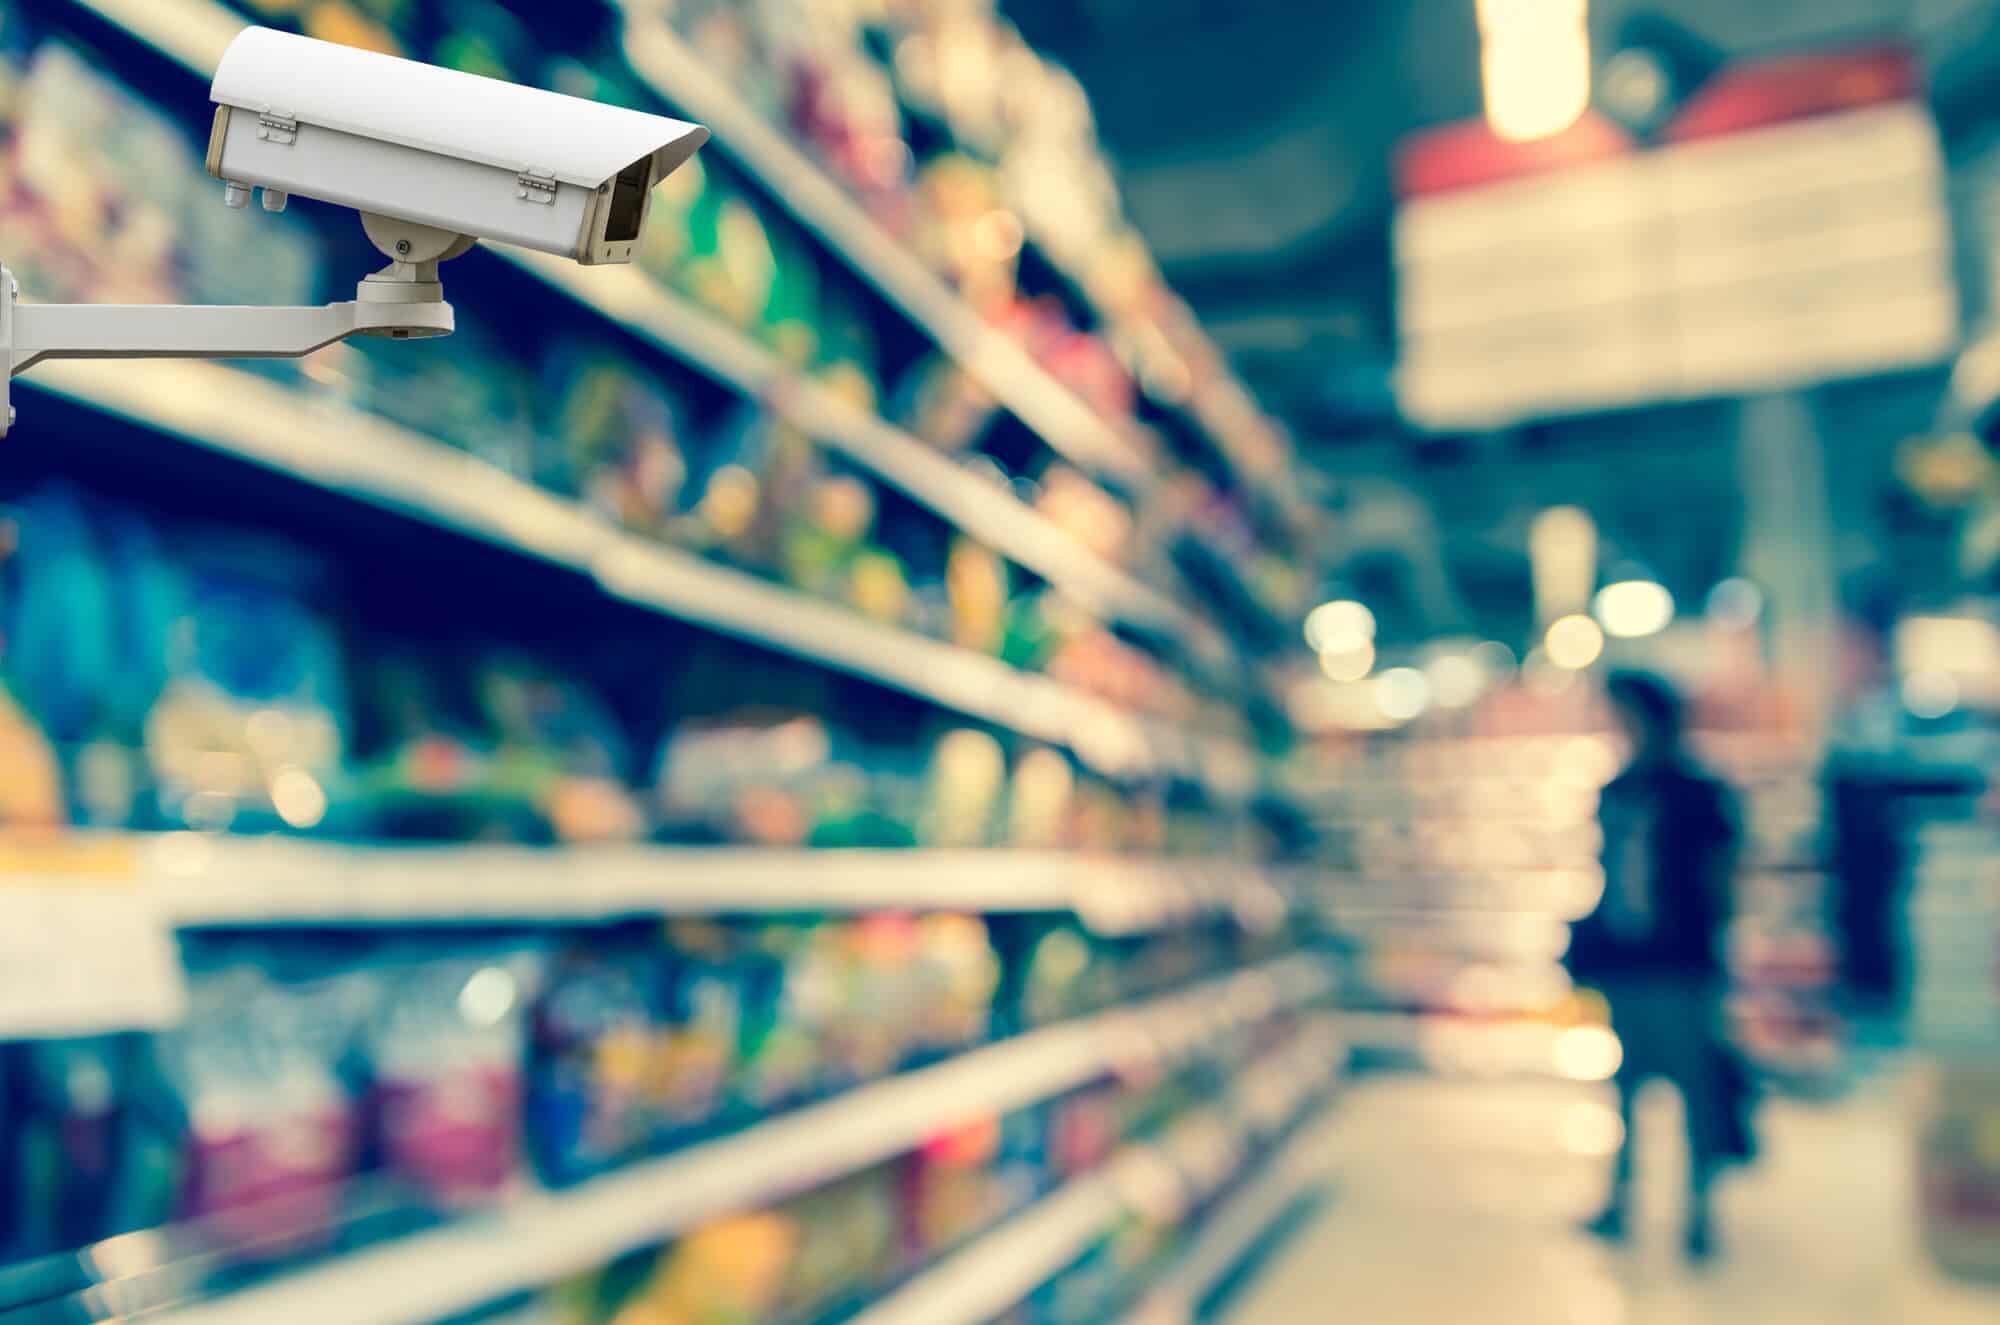 evitar furtos no supermercado